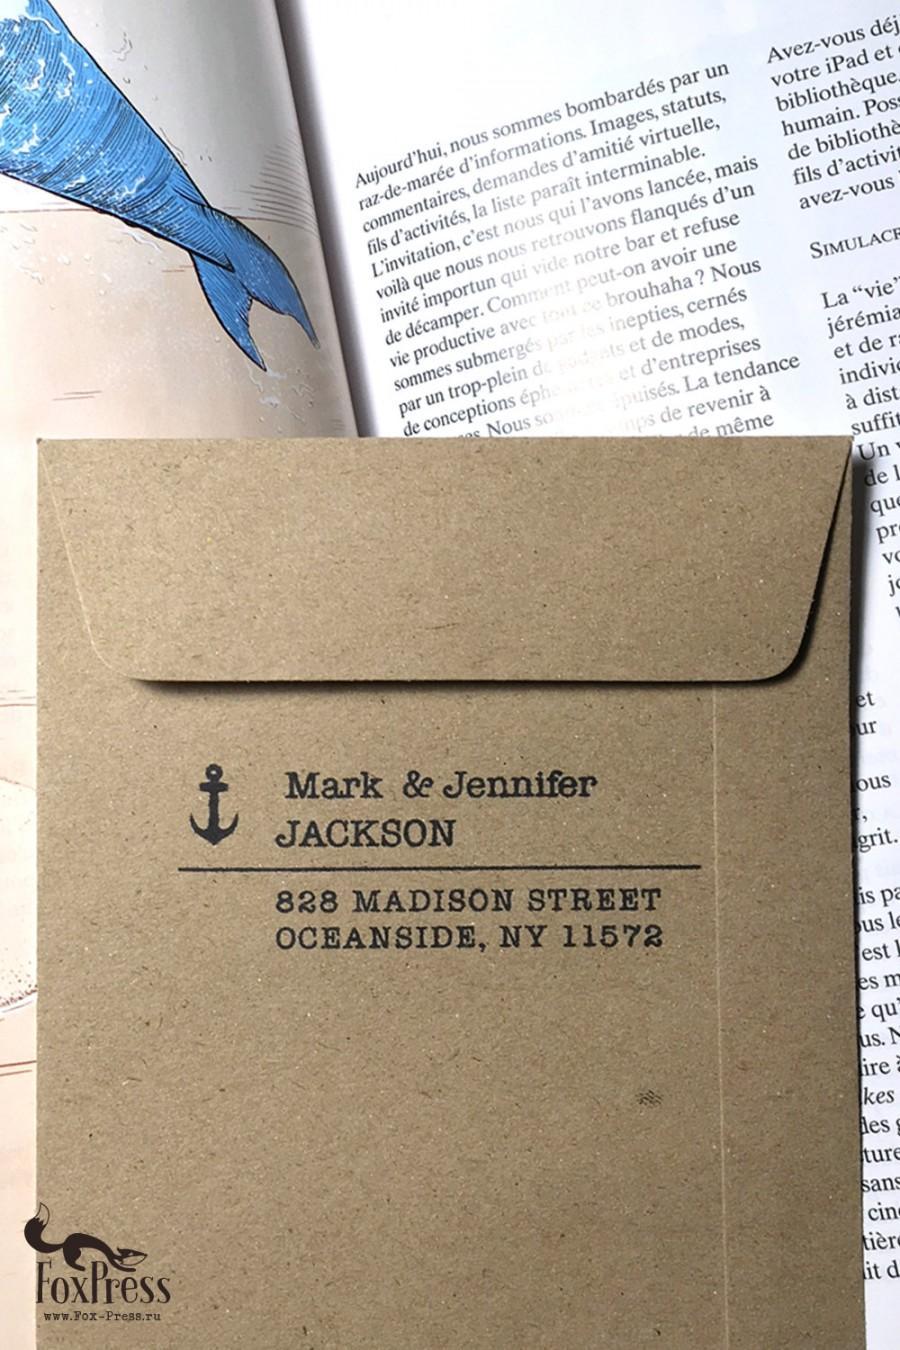 Mariage - Custom Return Address Stamp - 4 x 2 Inches (10 x 5 cm)